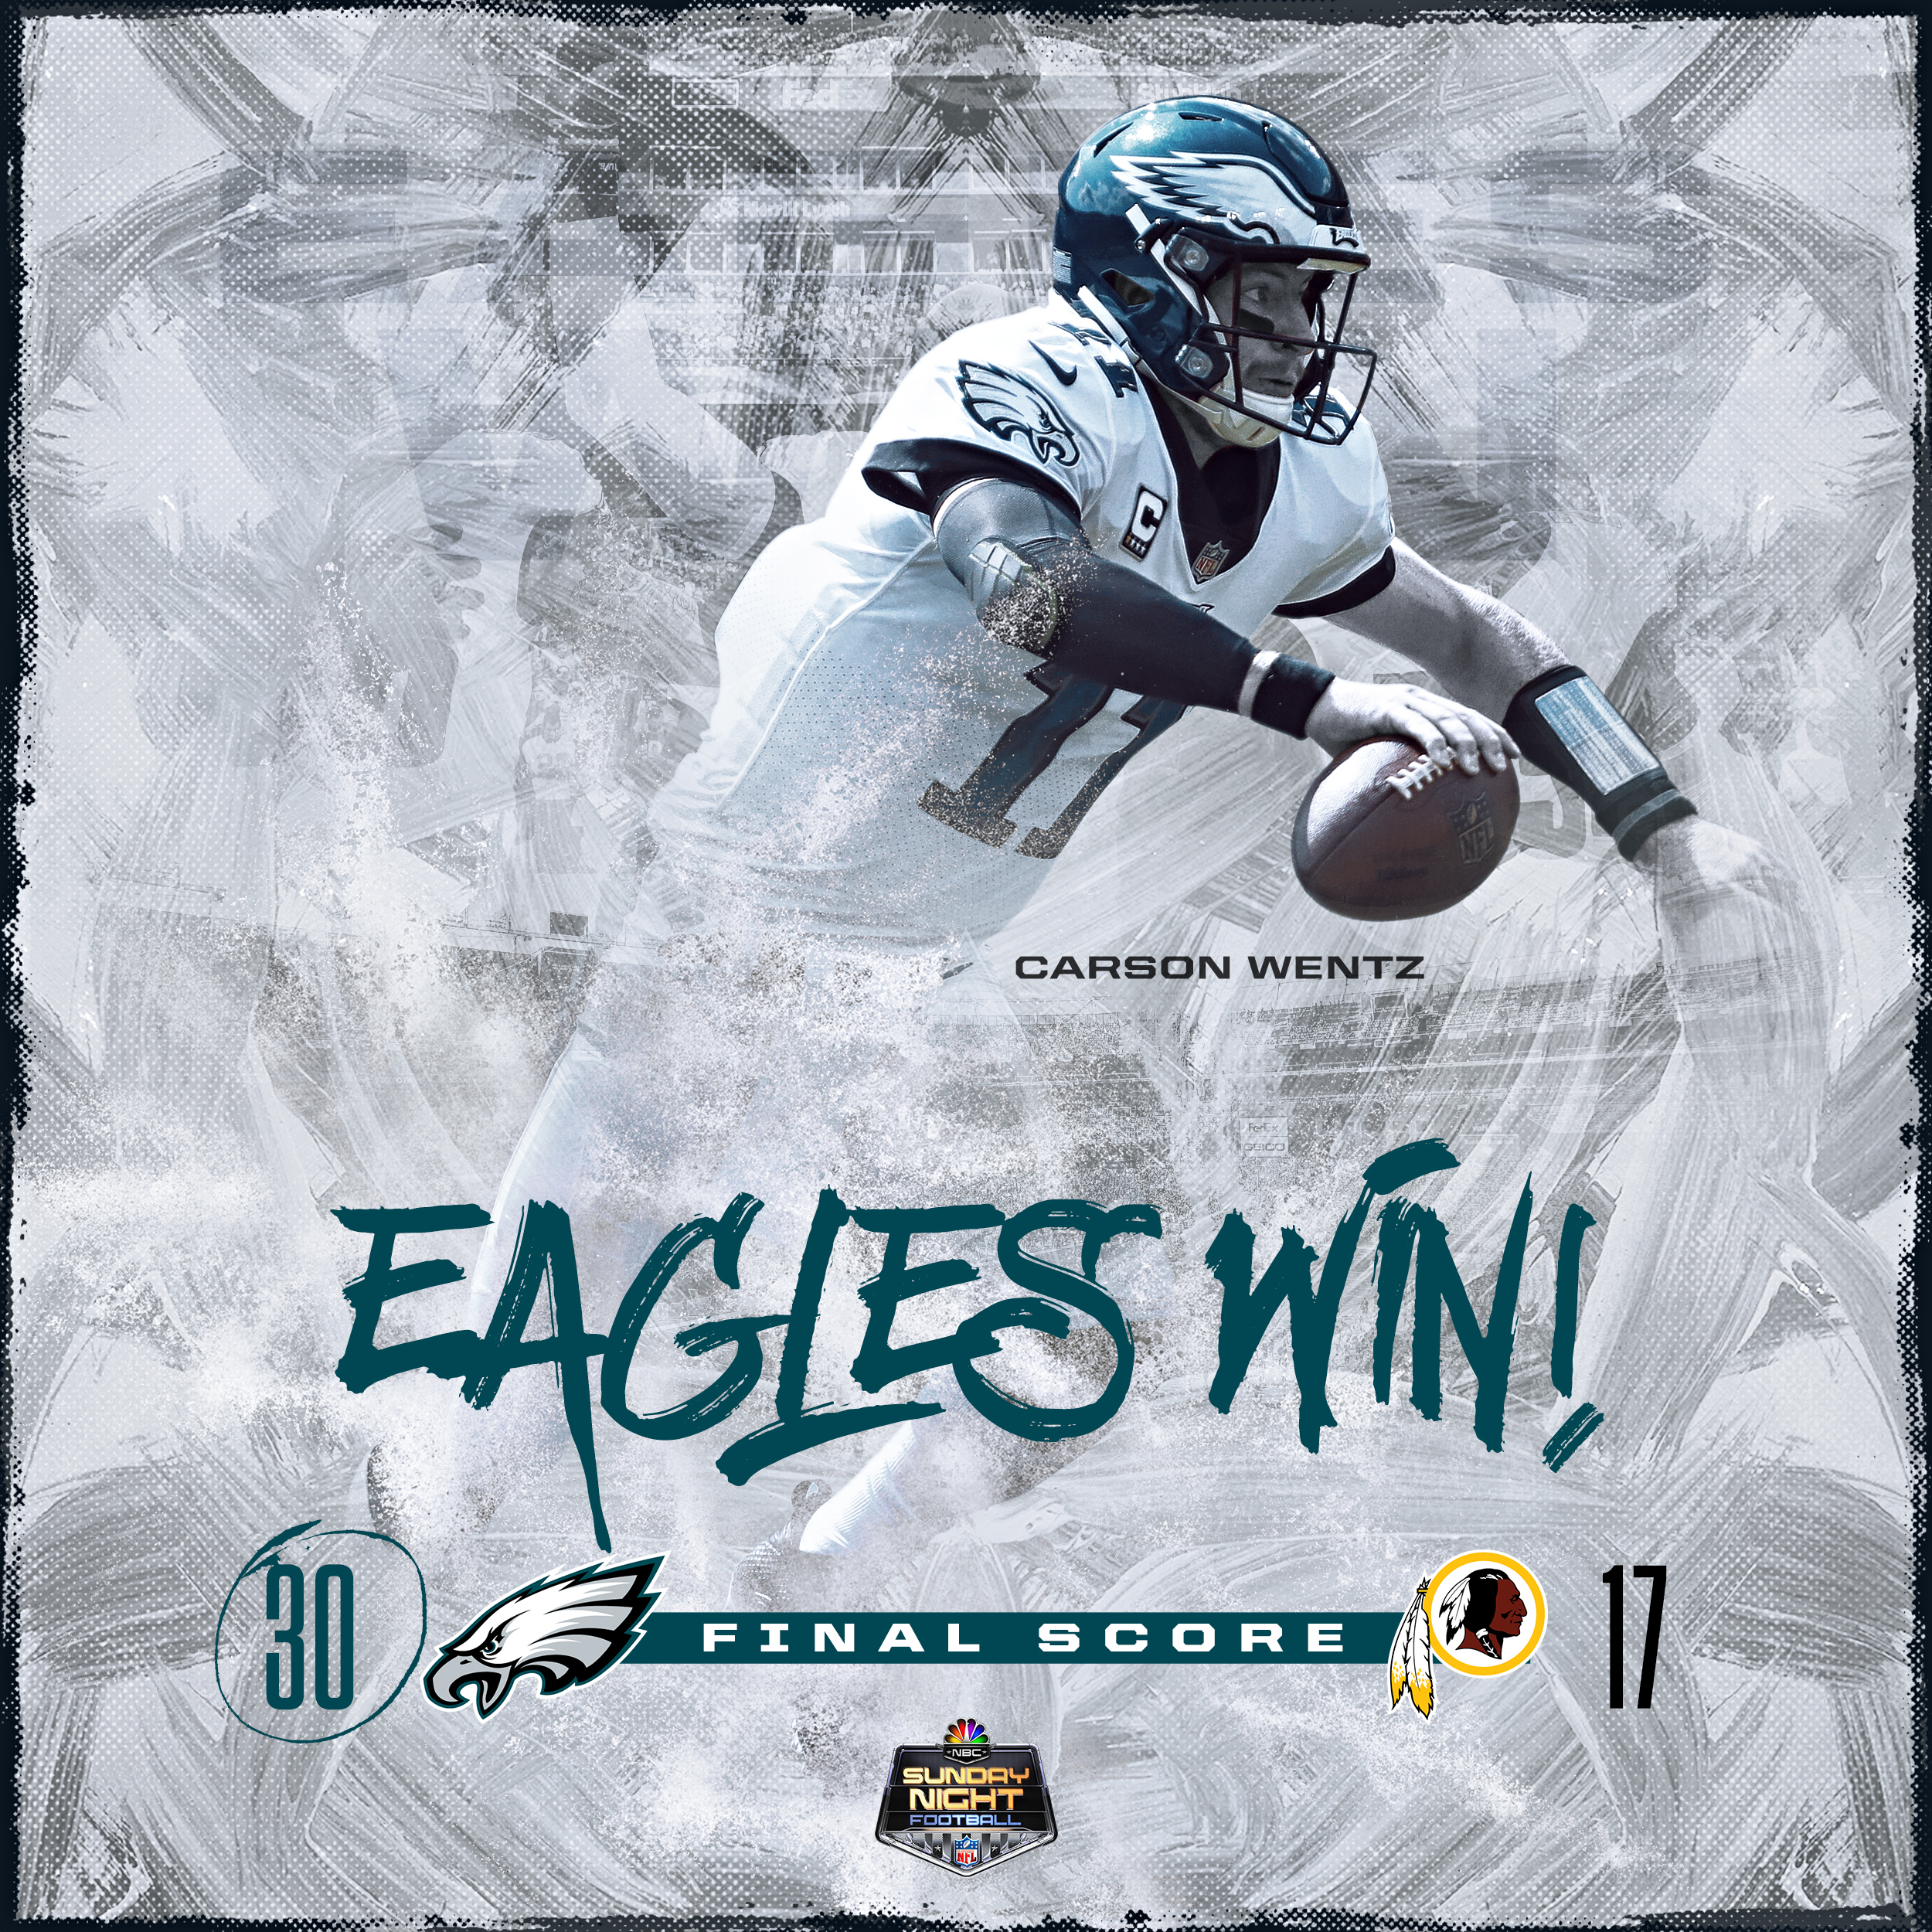 NBC_Philadelphia_Eagles_Win_Graphic.JPG